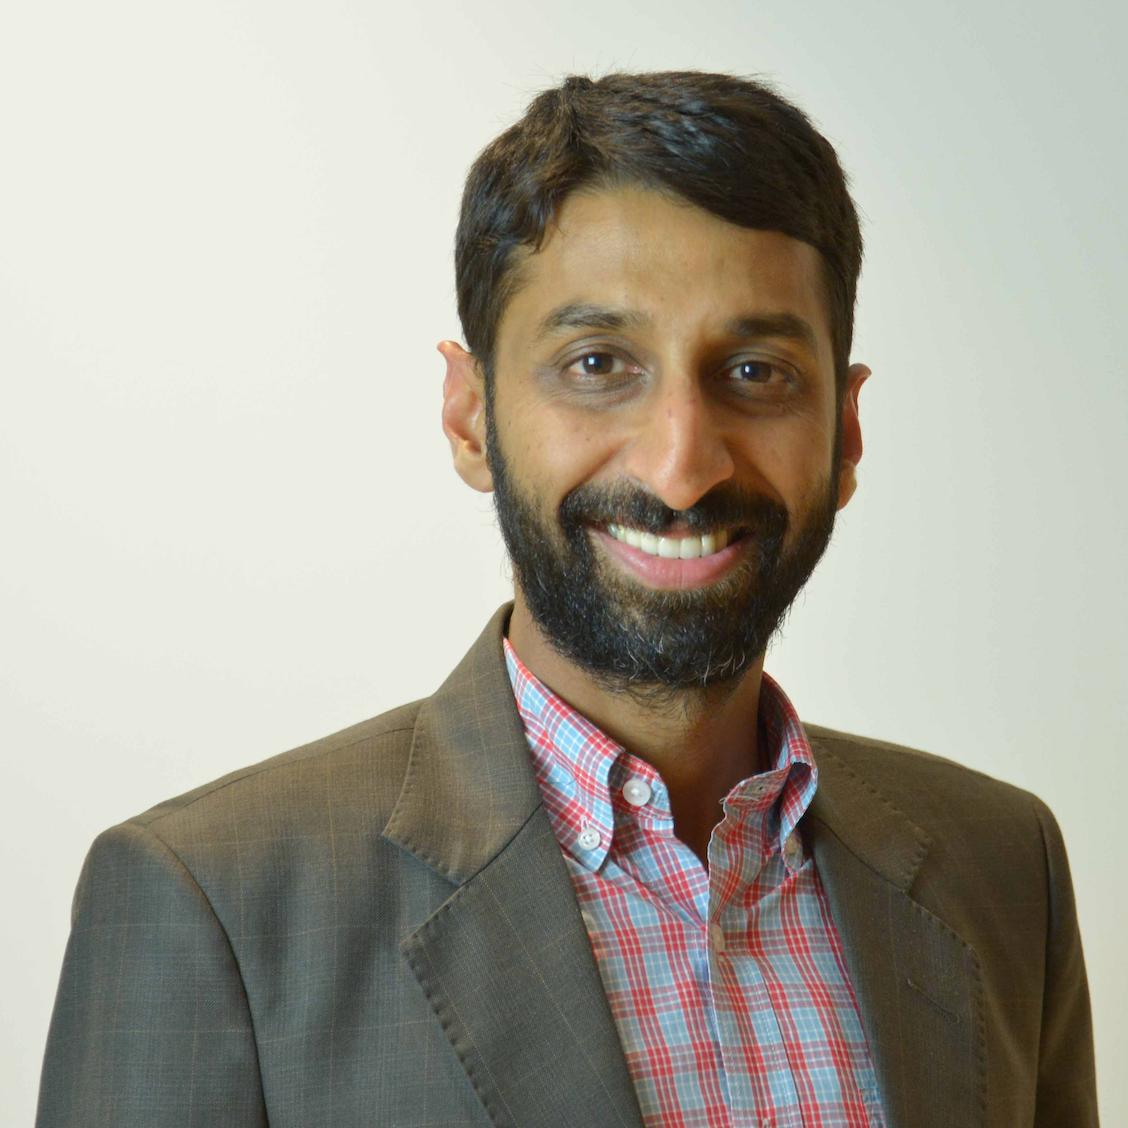 Ankur Jain from Emergent Ventures